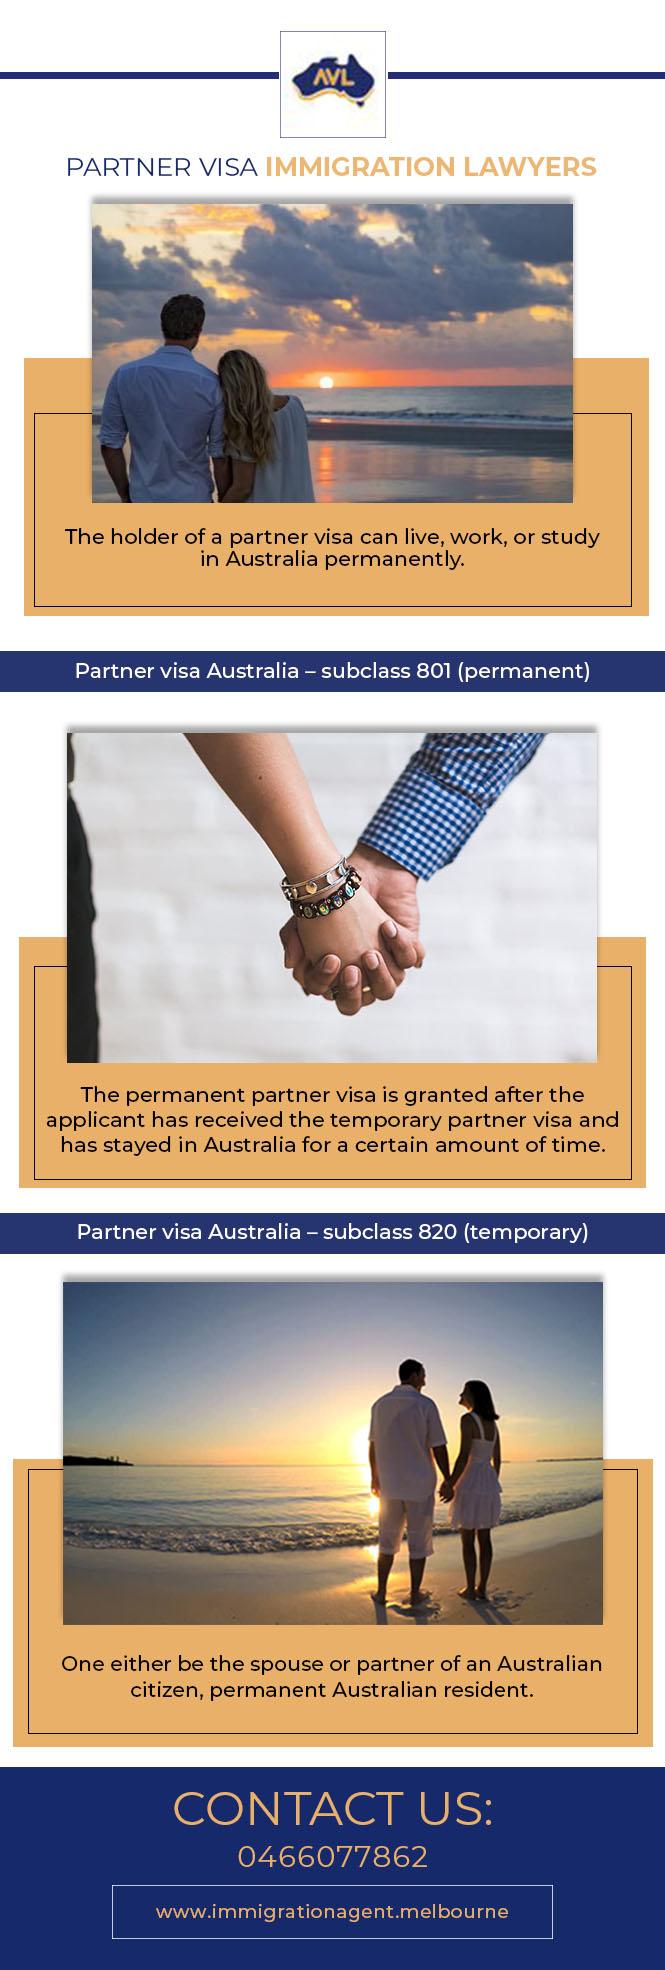 Partner Visa Immigration Lawyers – Immigration Agent Melbourne